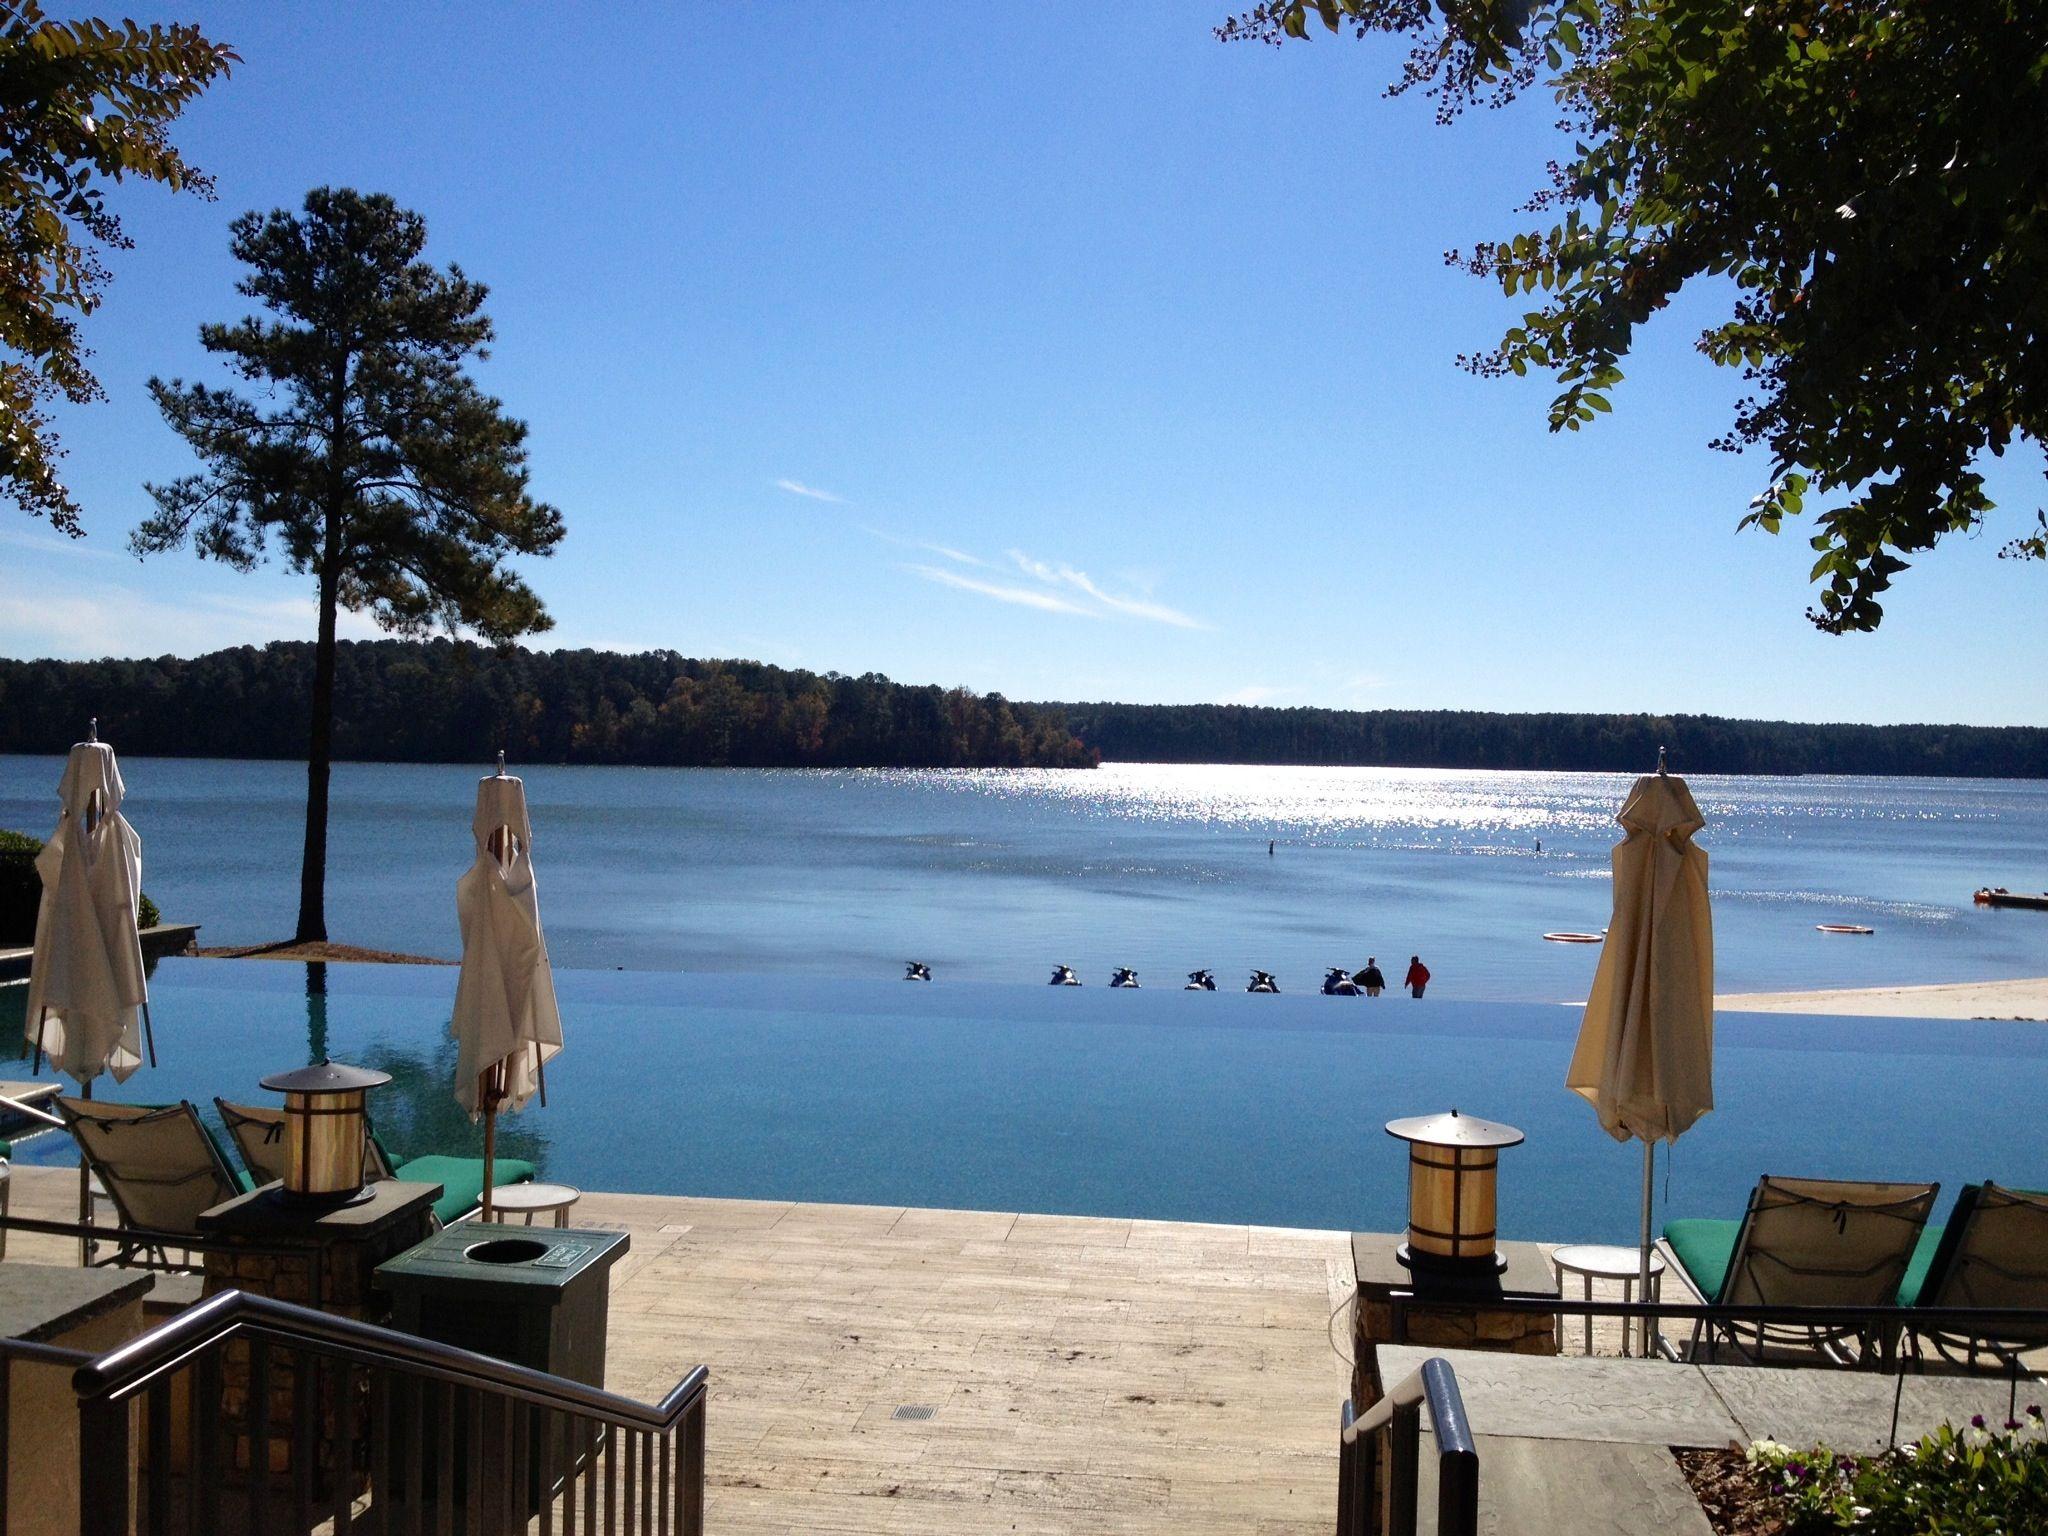 The RitzCarlton Reynolds, Lake Oconee Lake oconee